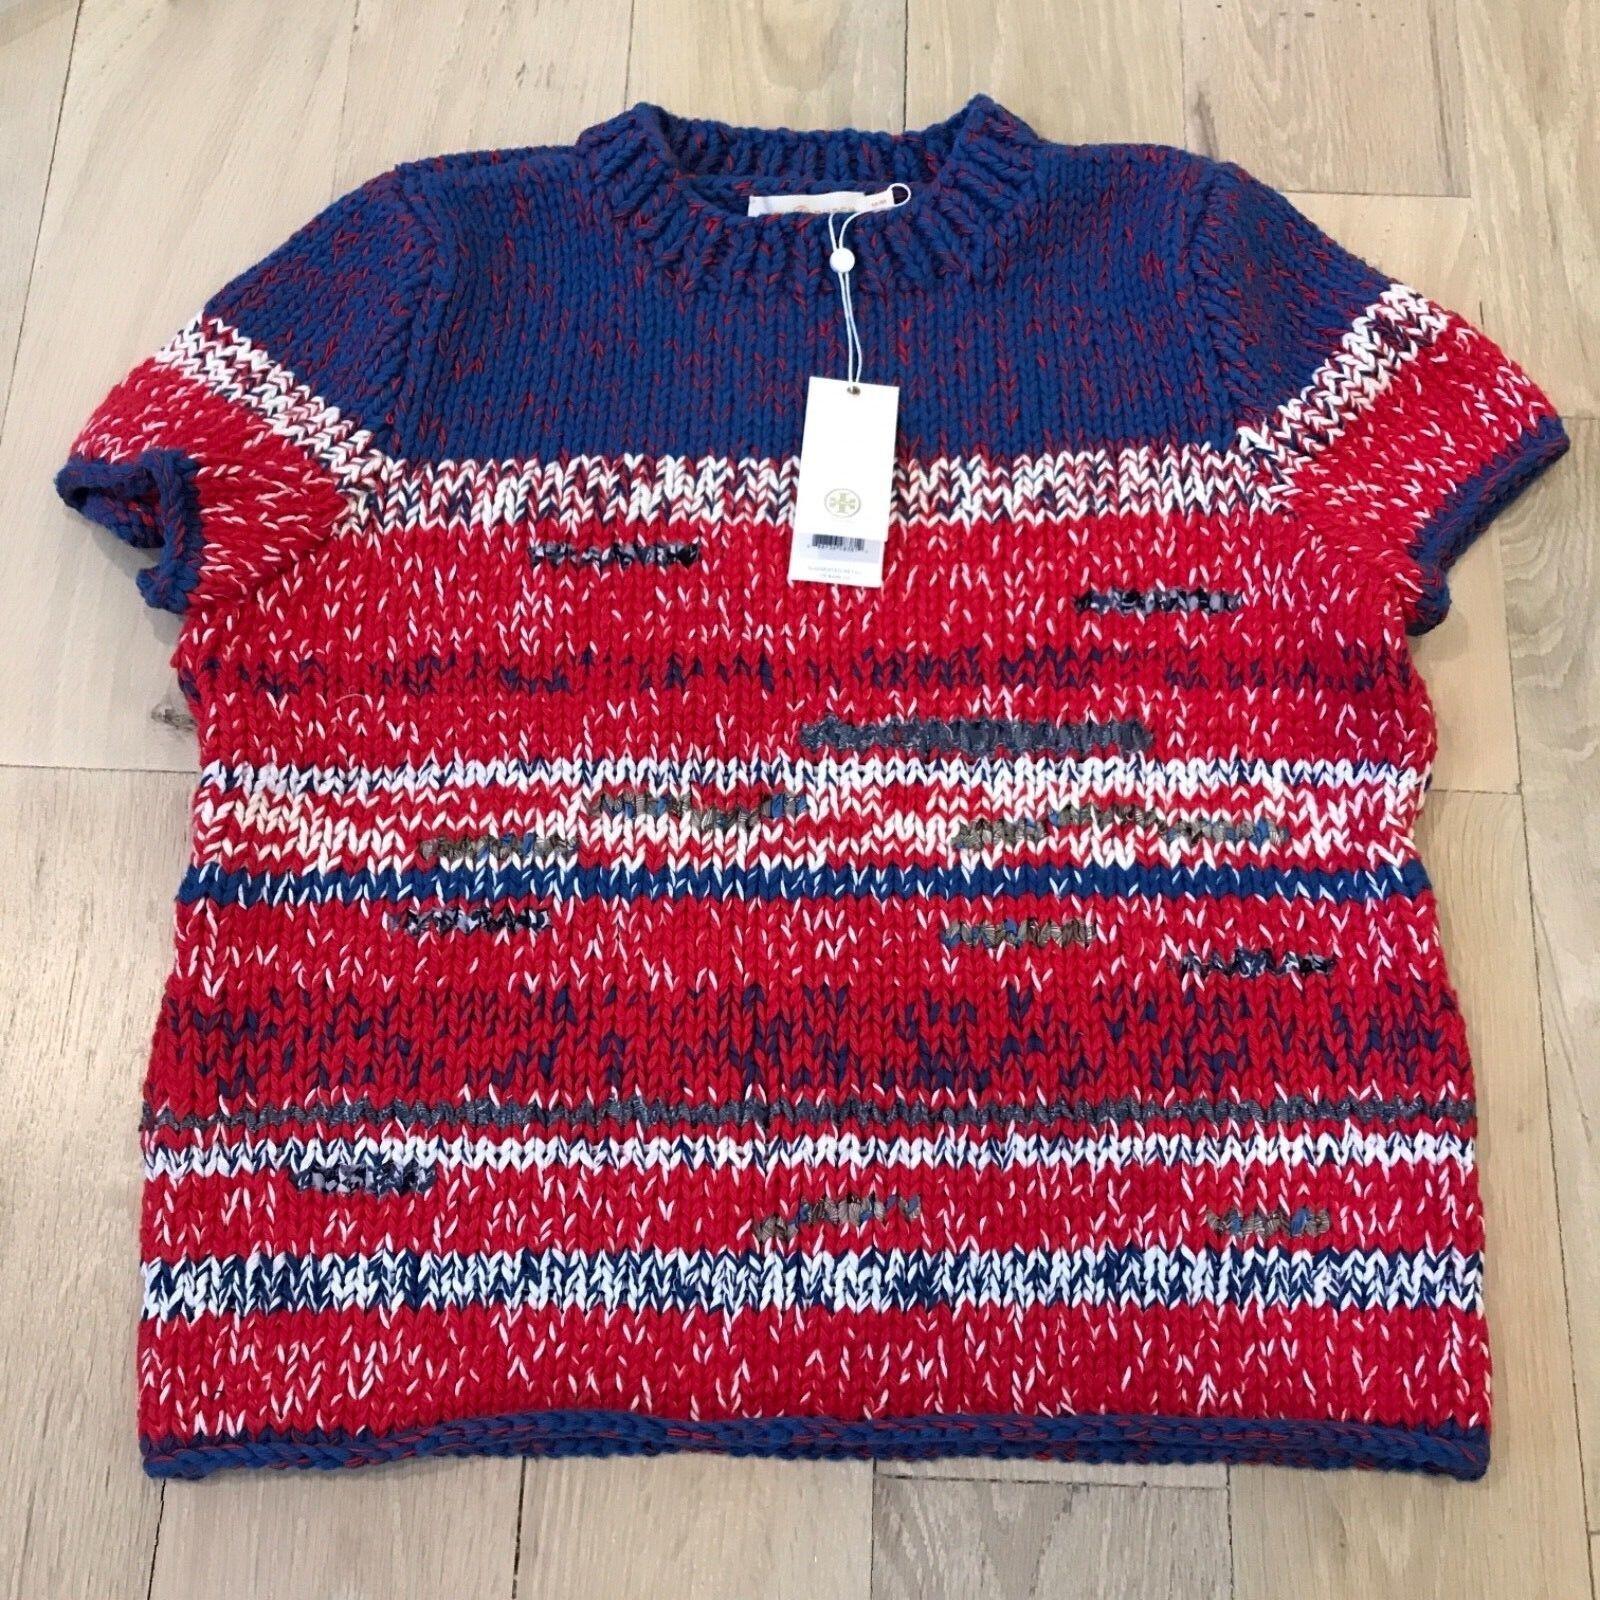 Tory Burch Brilliant Red Mouline Short Sleeve Sweater Cotton bluee Medium NWT